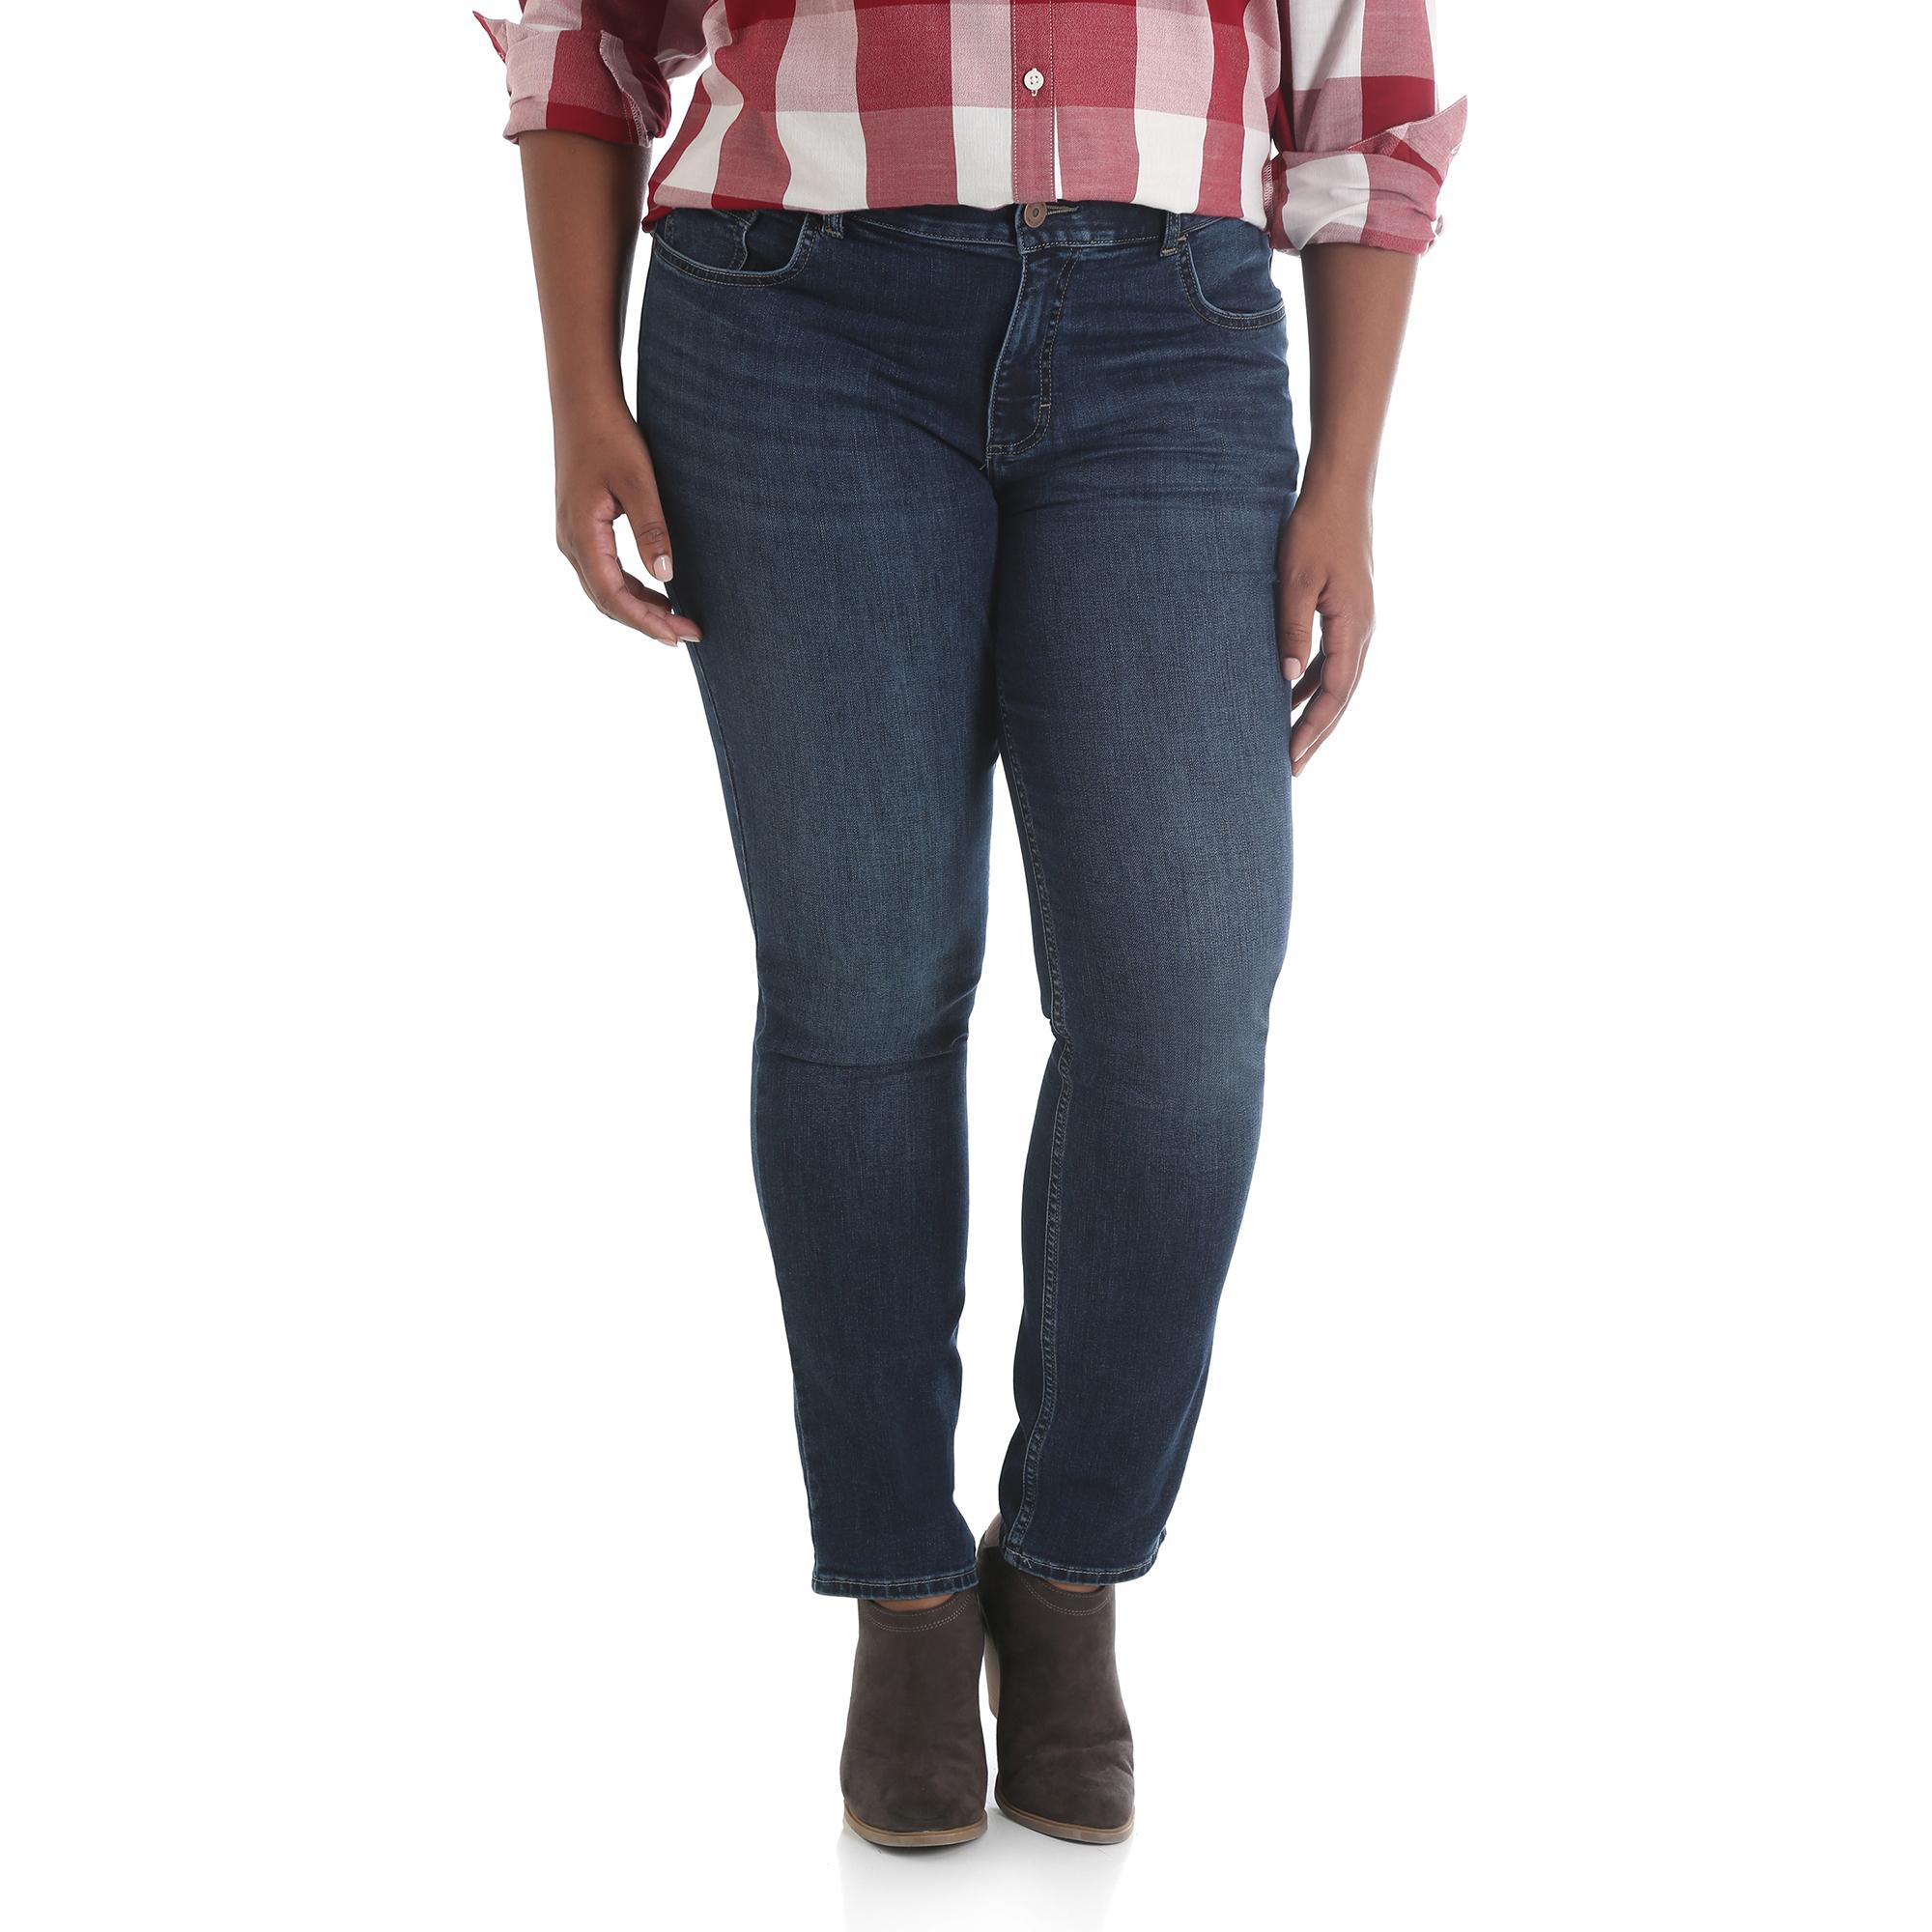 157SSW6 - Midrise Slim Straight Jean